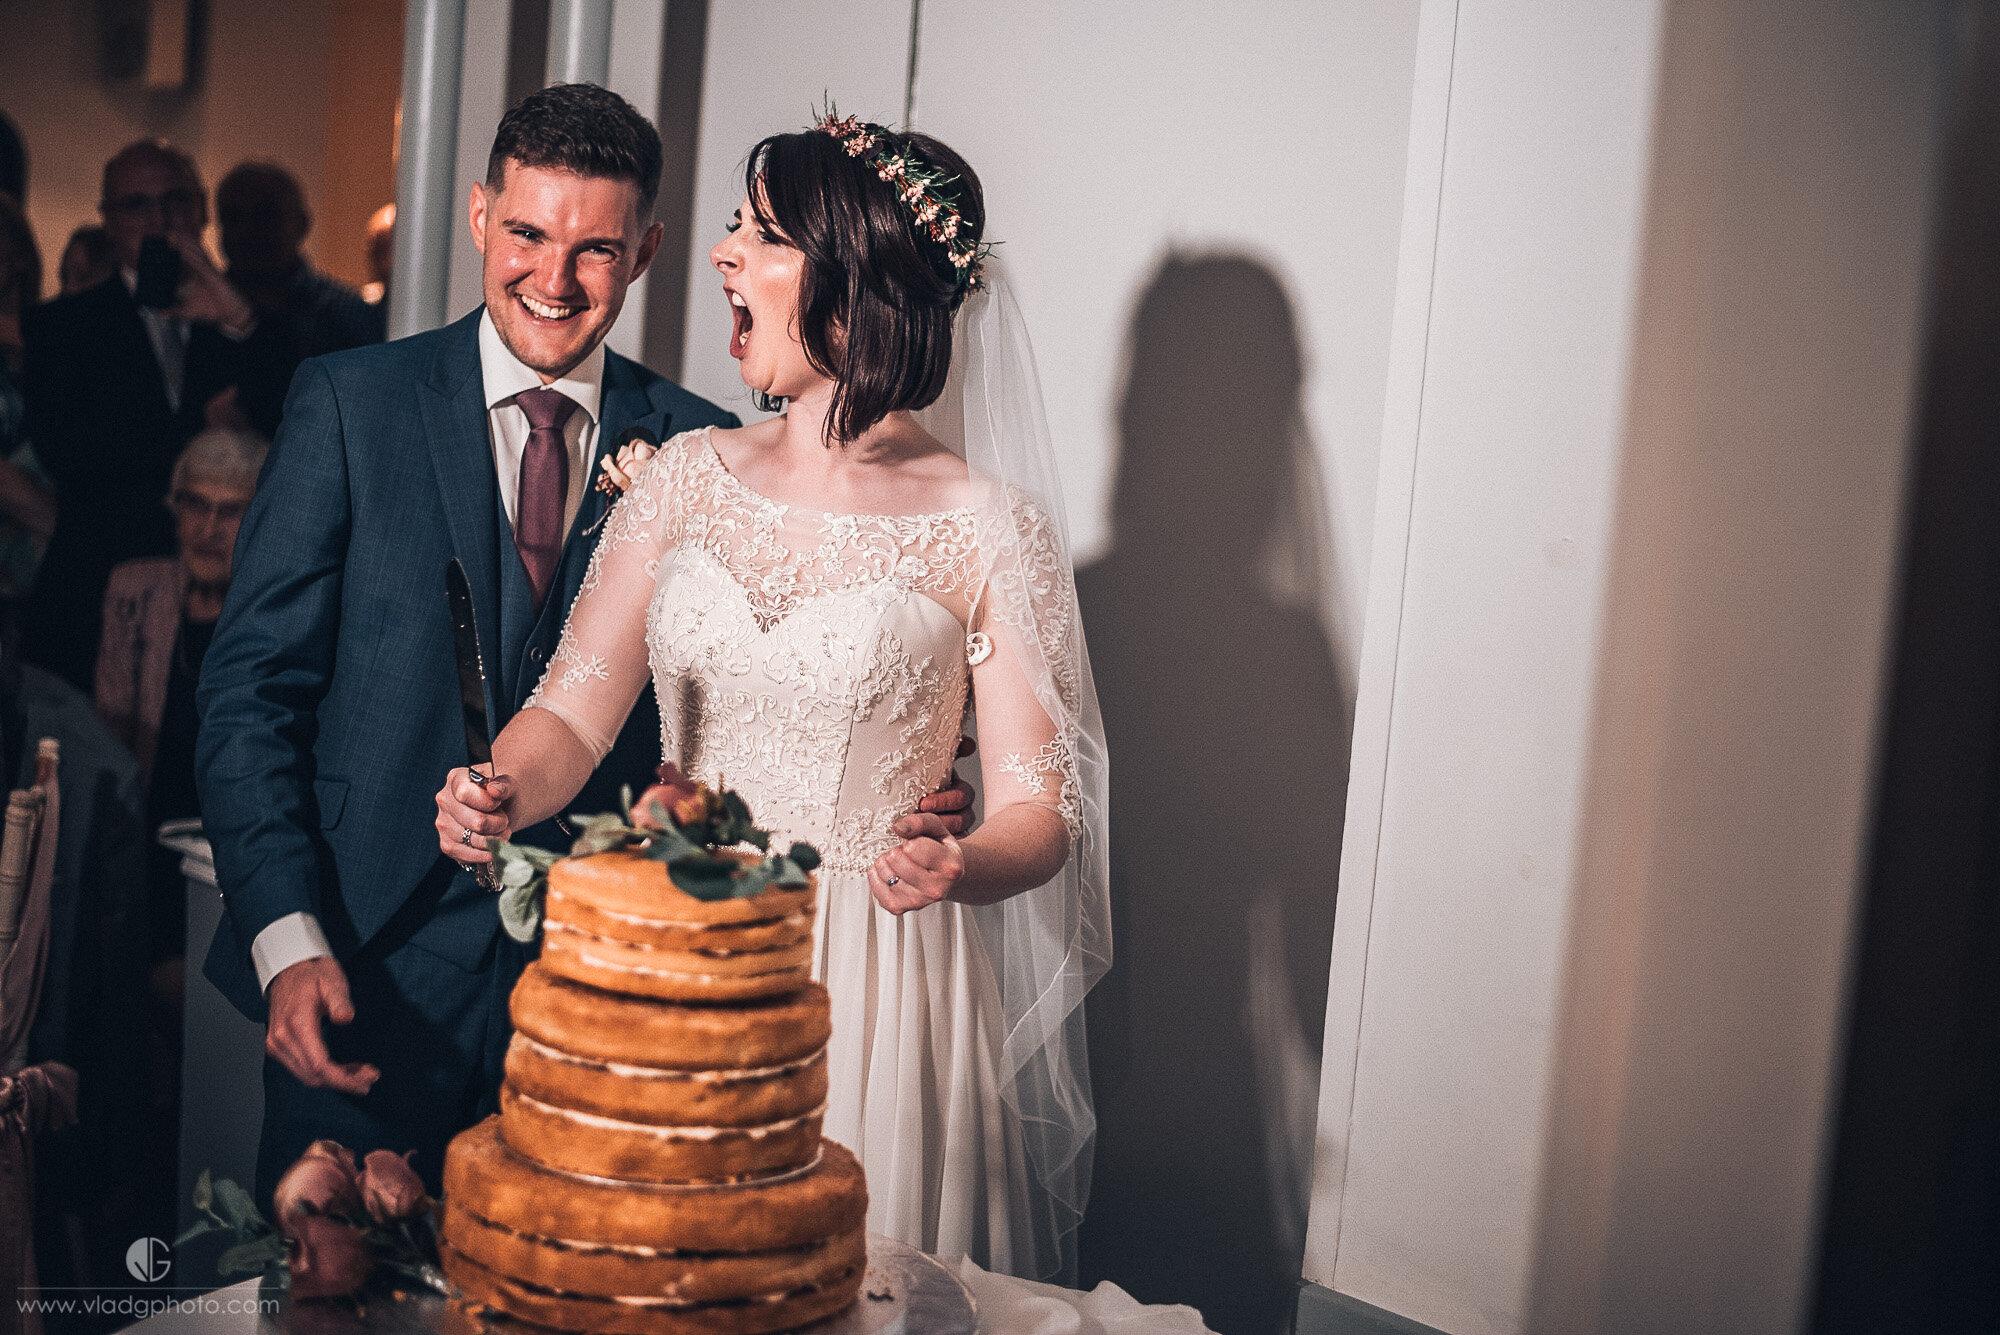 Wedding Photographer Gisburn Lancashire_4.jpg